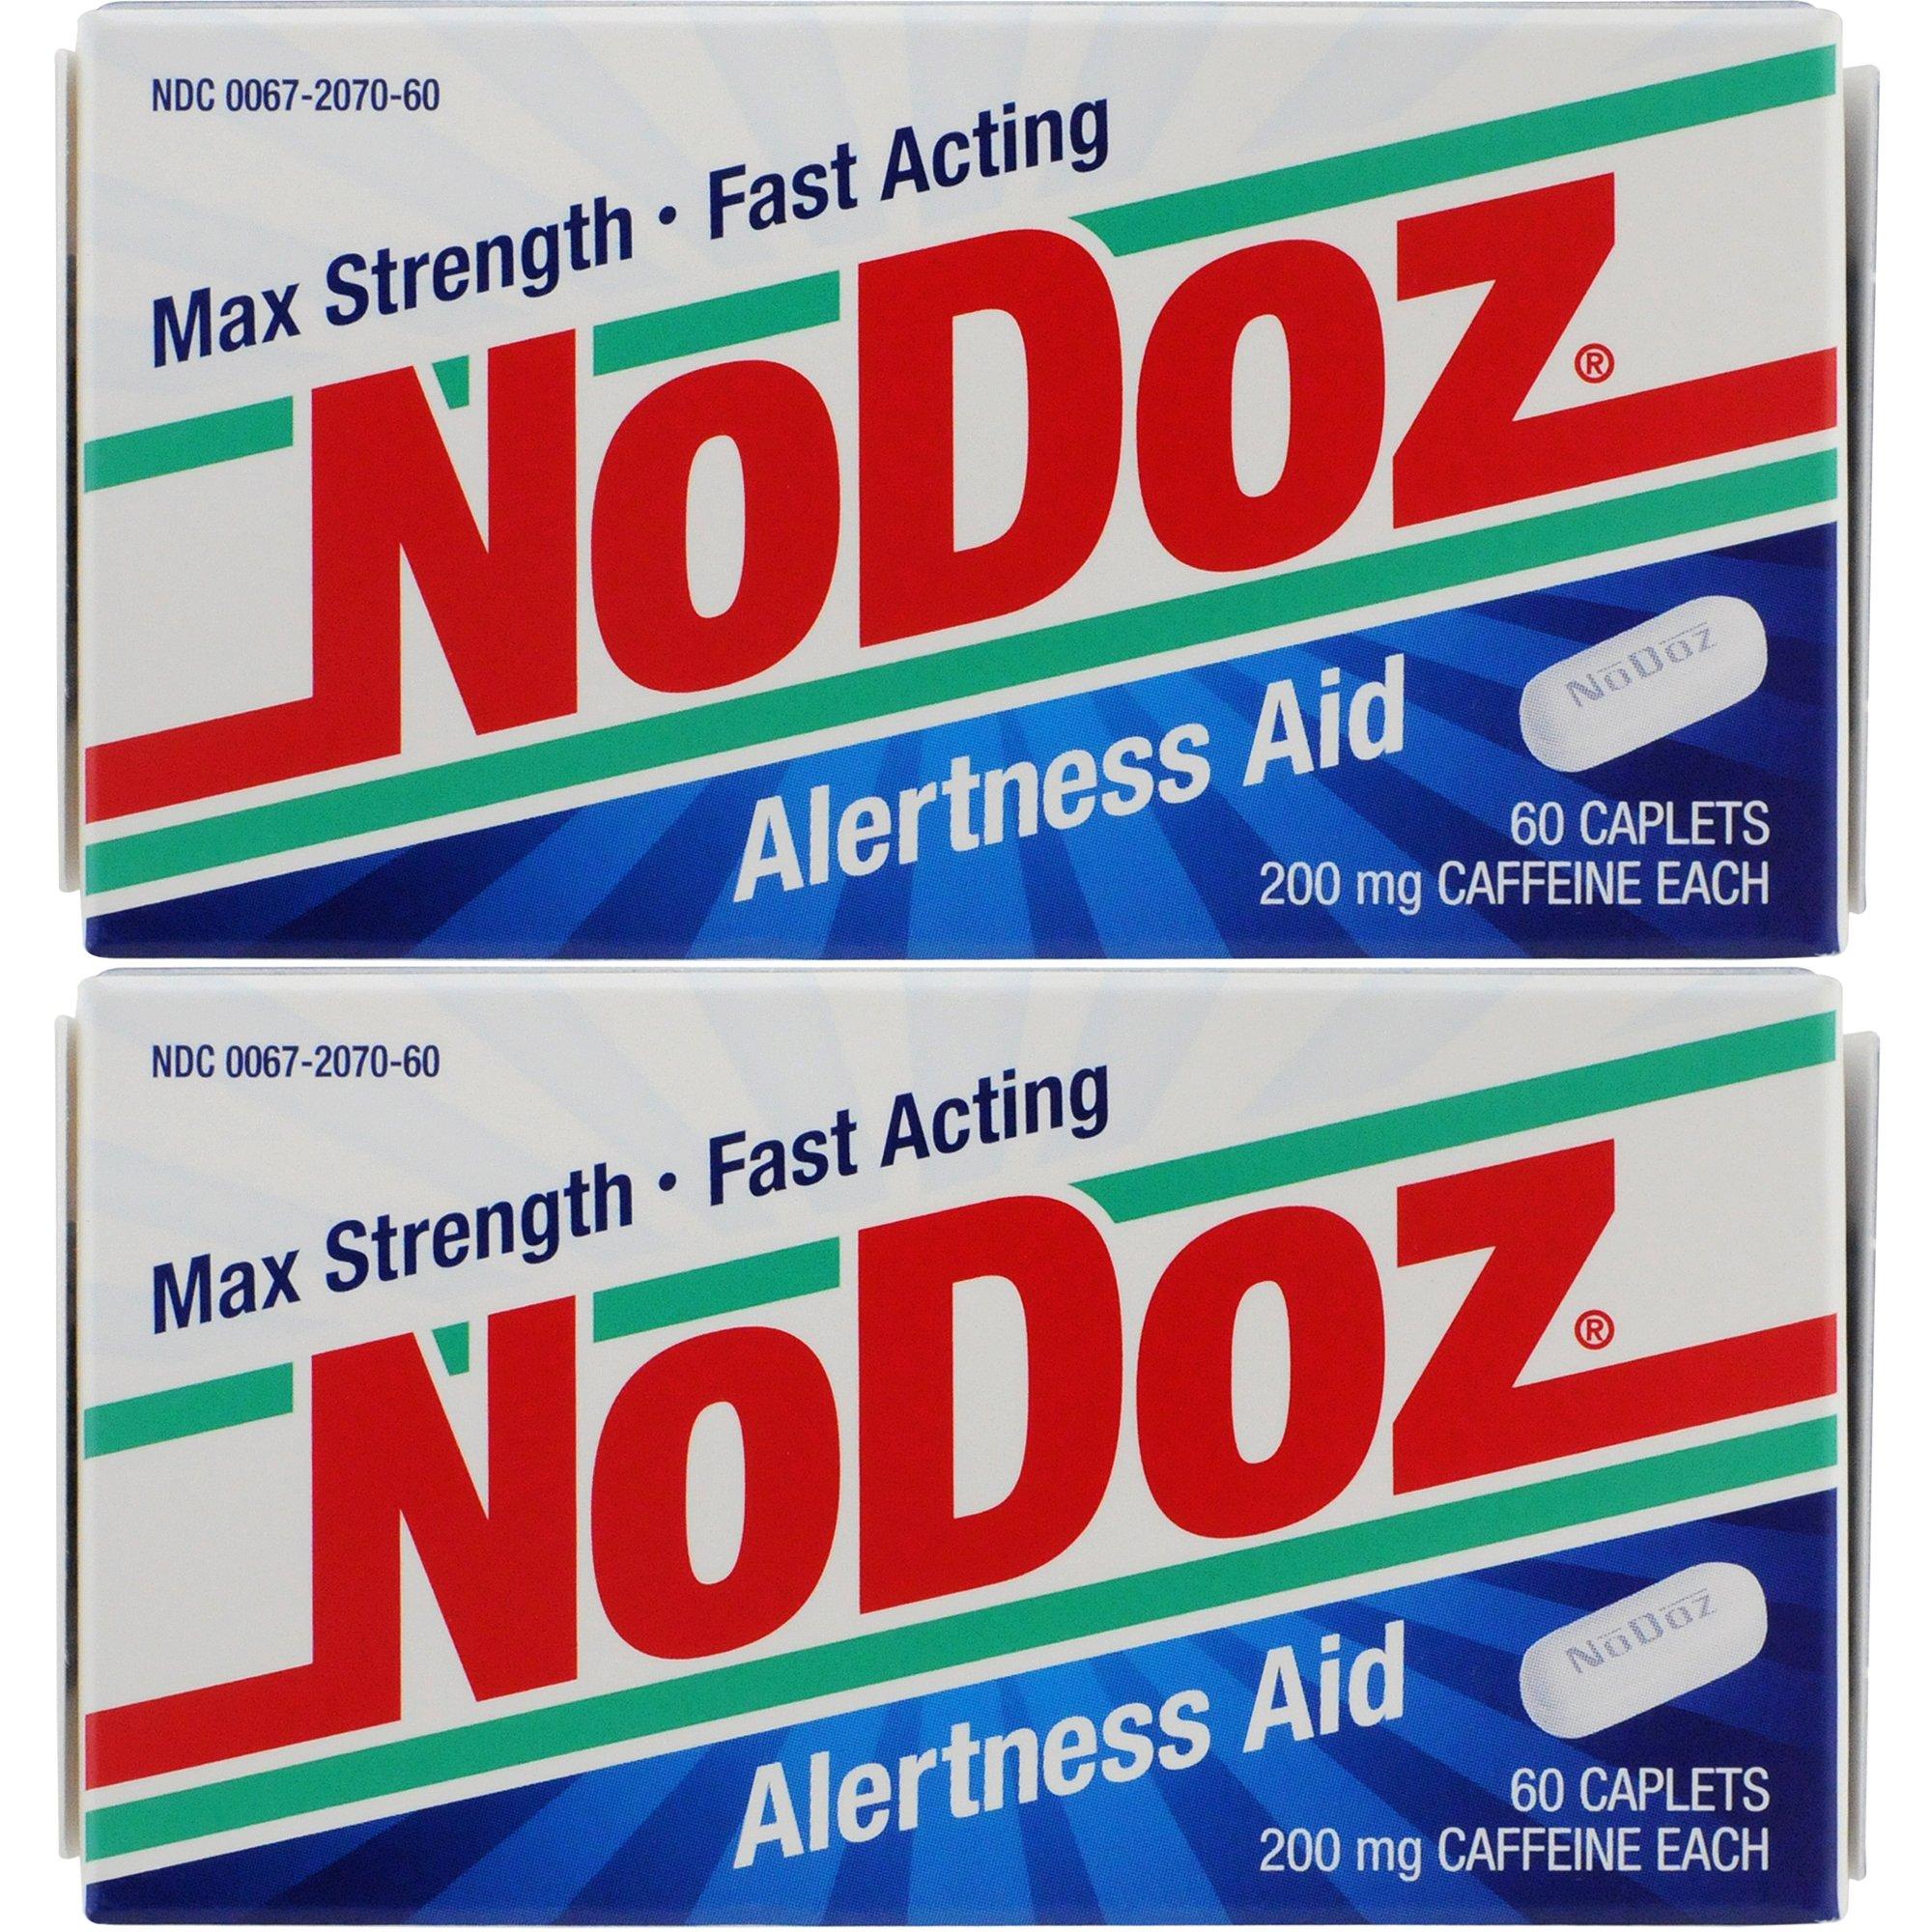 NoDoz Maximum Strength Alertness Aid 60 ct Caplets, Twin Pack